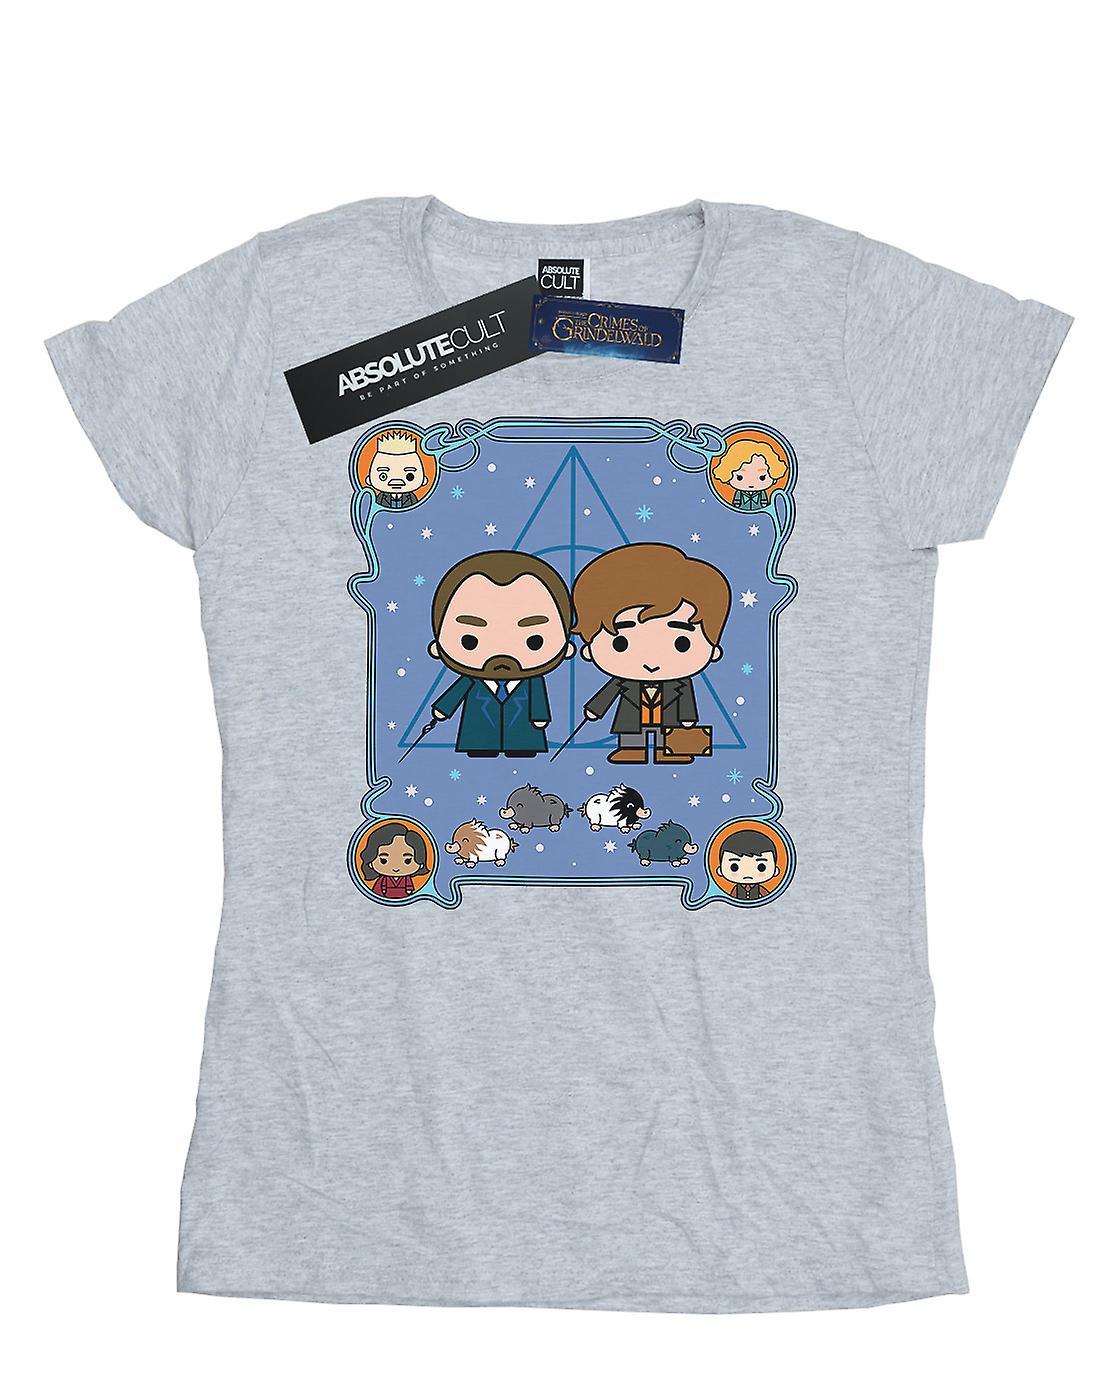 Fantastic Beasts Women's Chibi Newt And Dumbledore T-Shirt